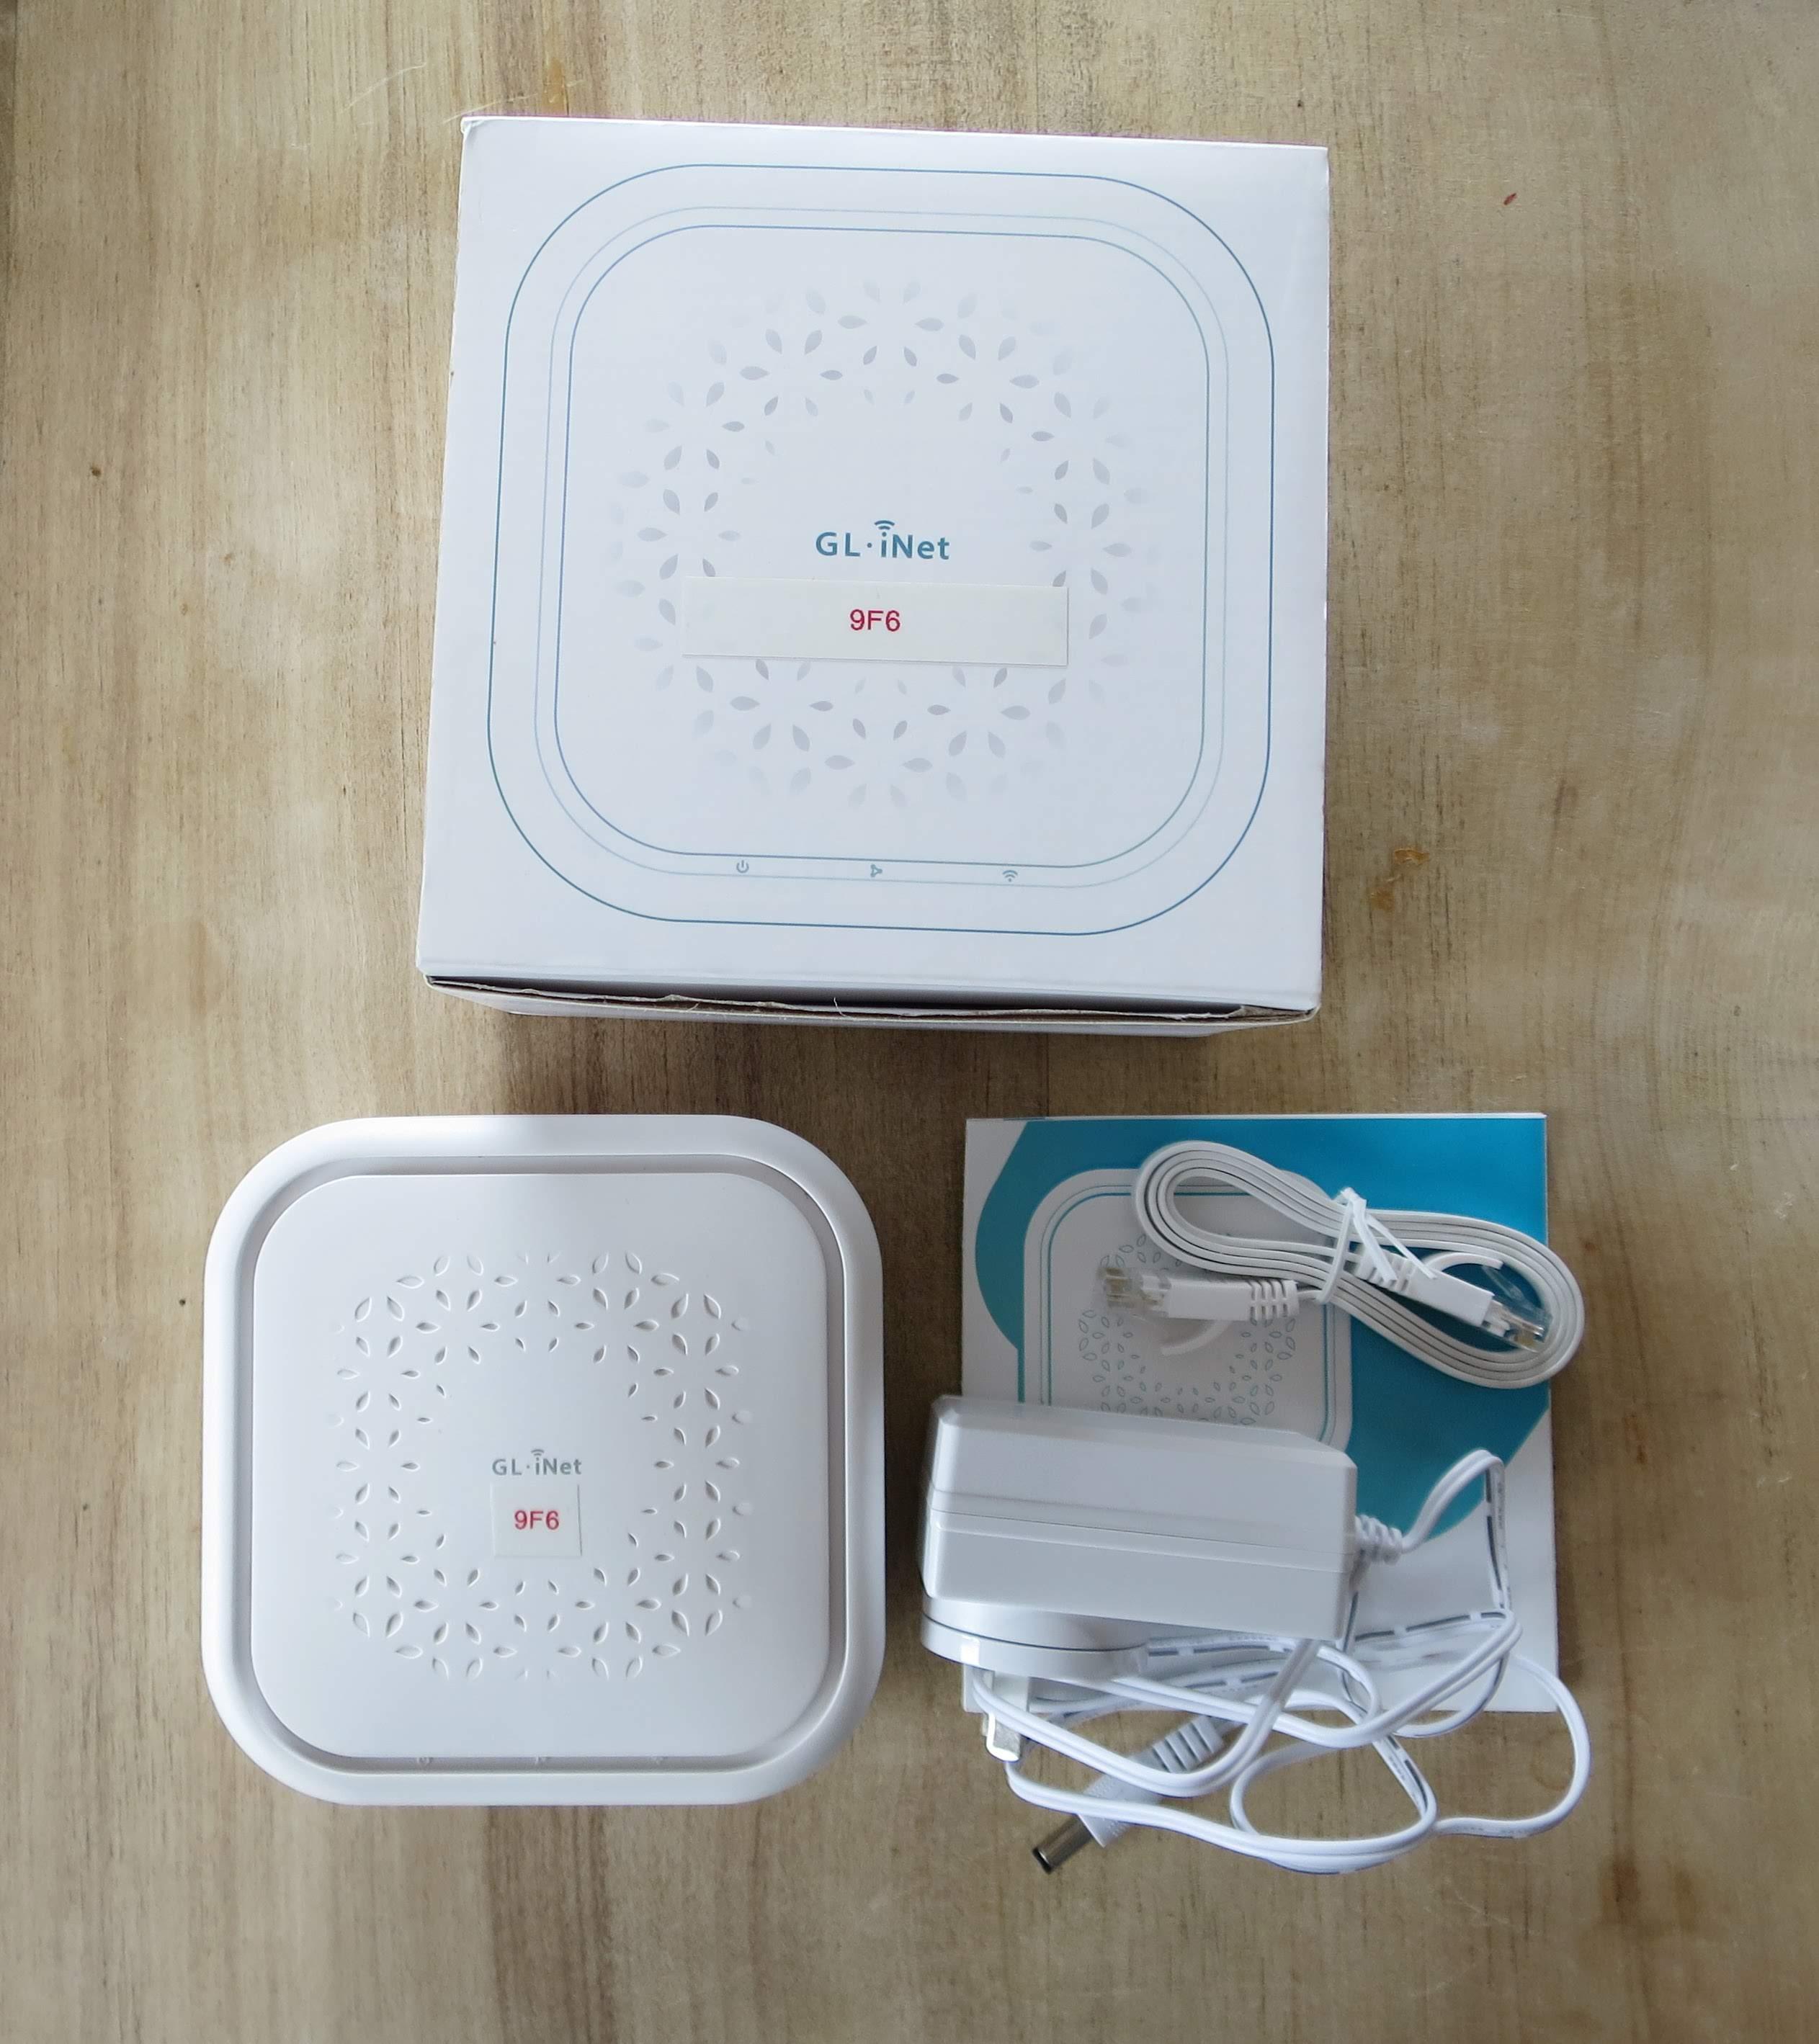 Gl-inet GL-B1300 – Convexa-B dual-band mesh router review